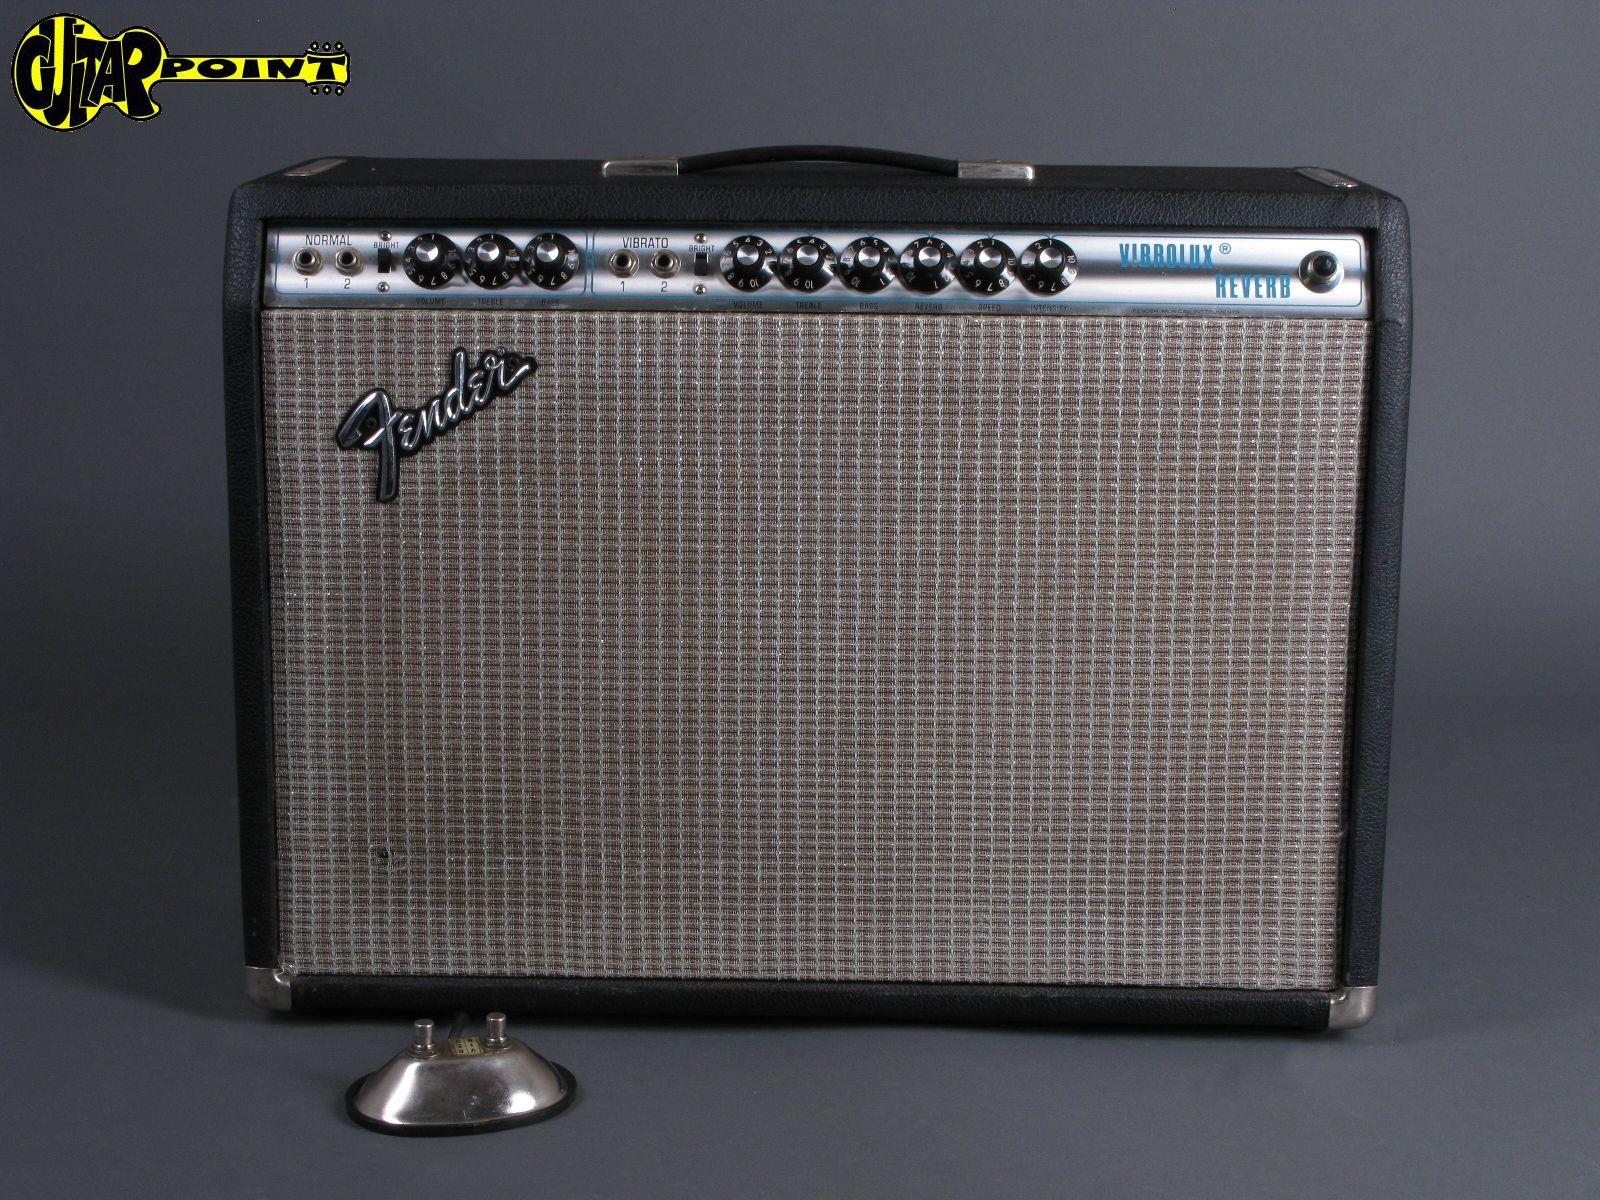 1974 Fender Vibrolux  Reverb Amp